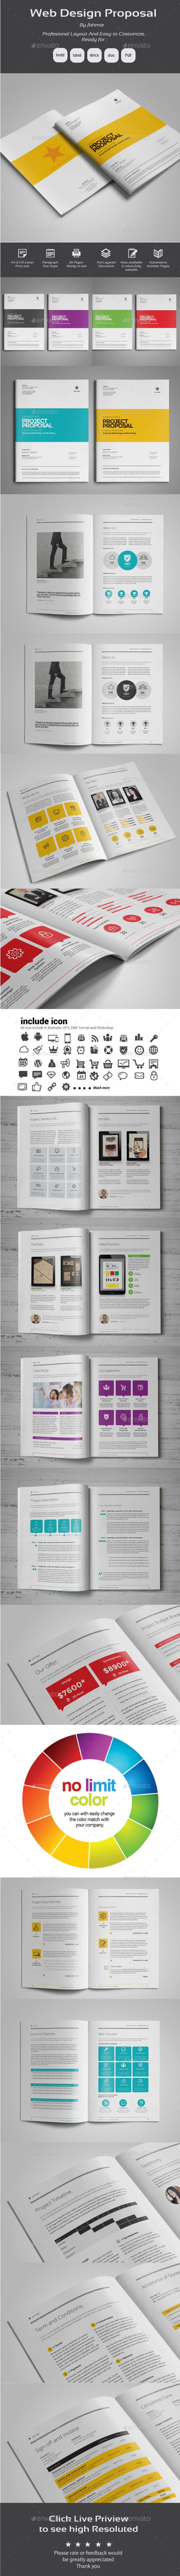 proposal report template%0A Proposal  Proposal TemplatesInvoice DesignBusiness ProposalReport